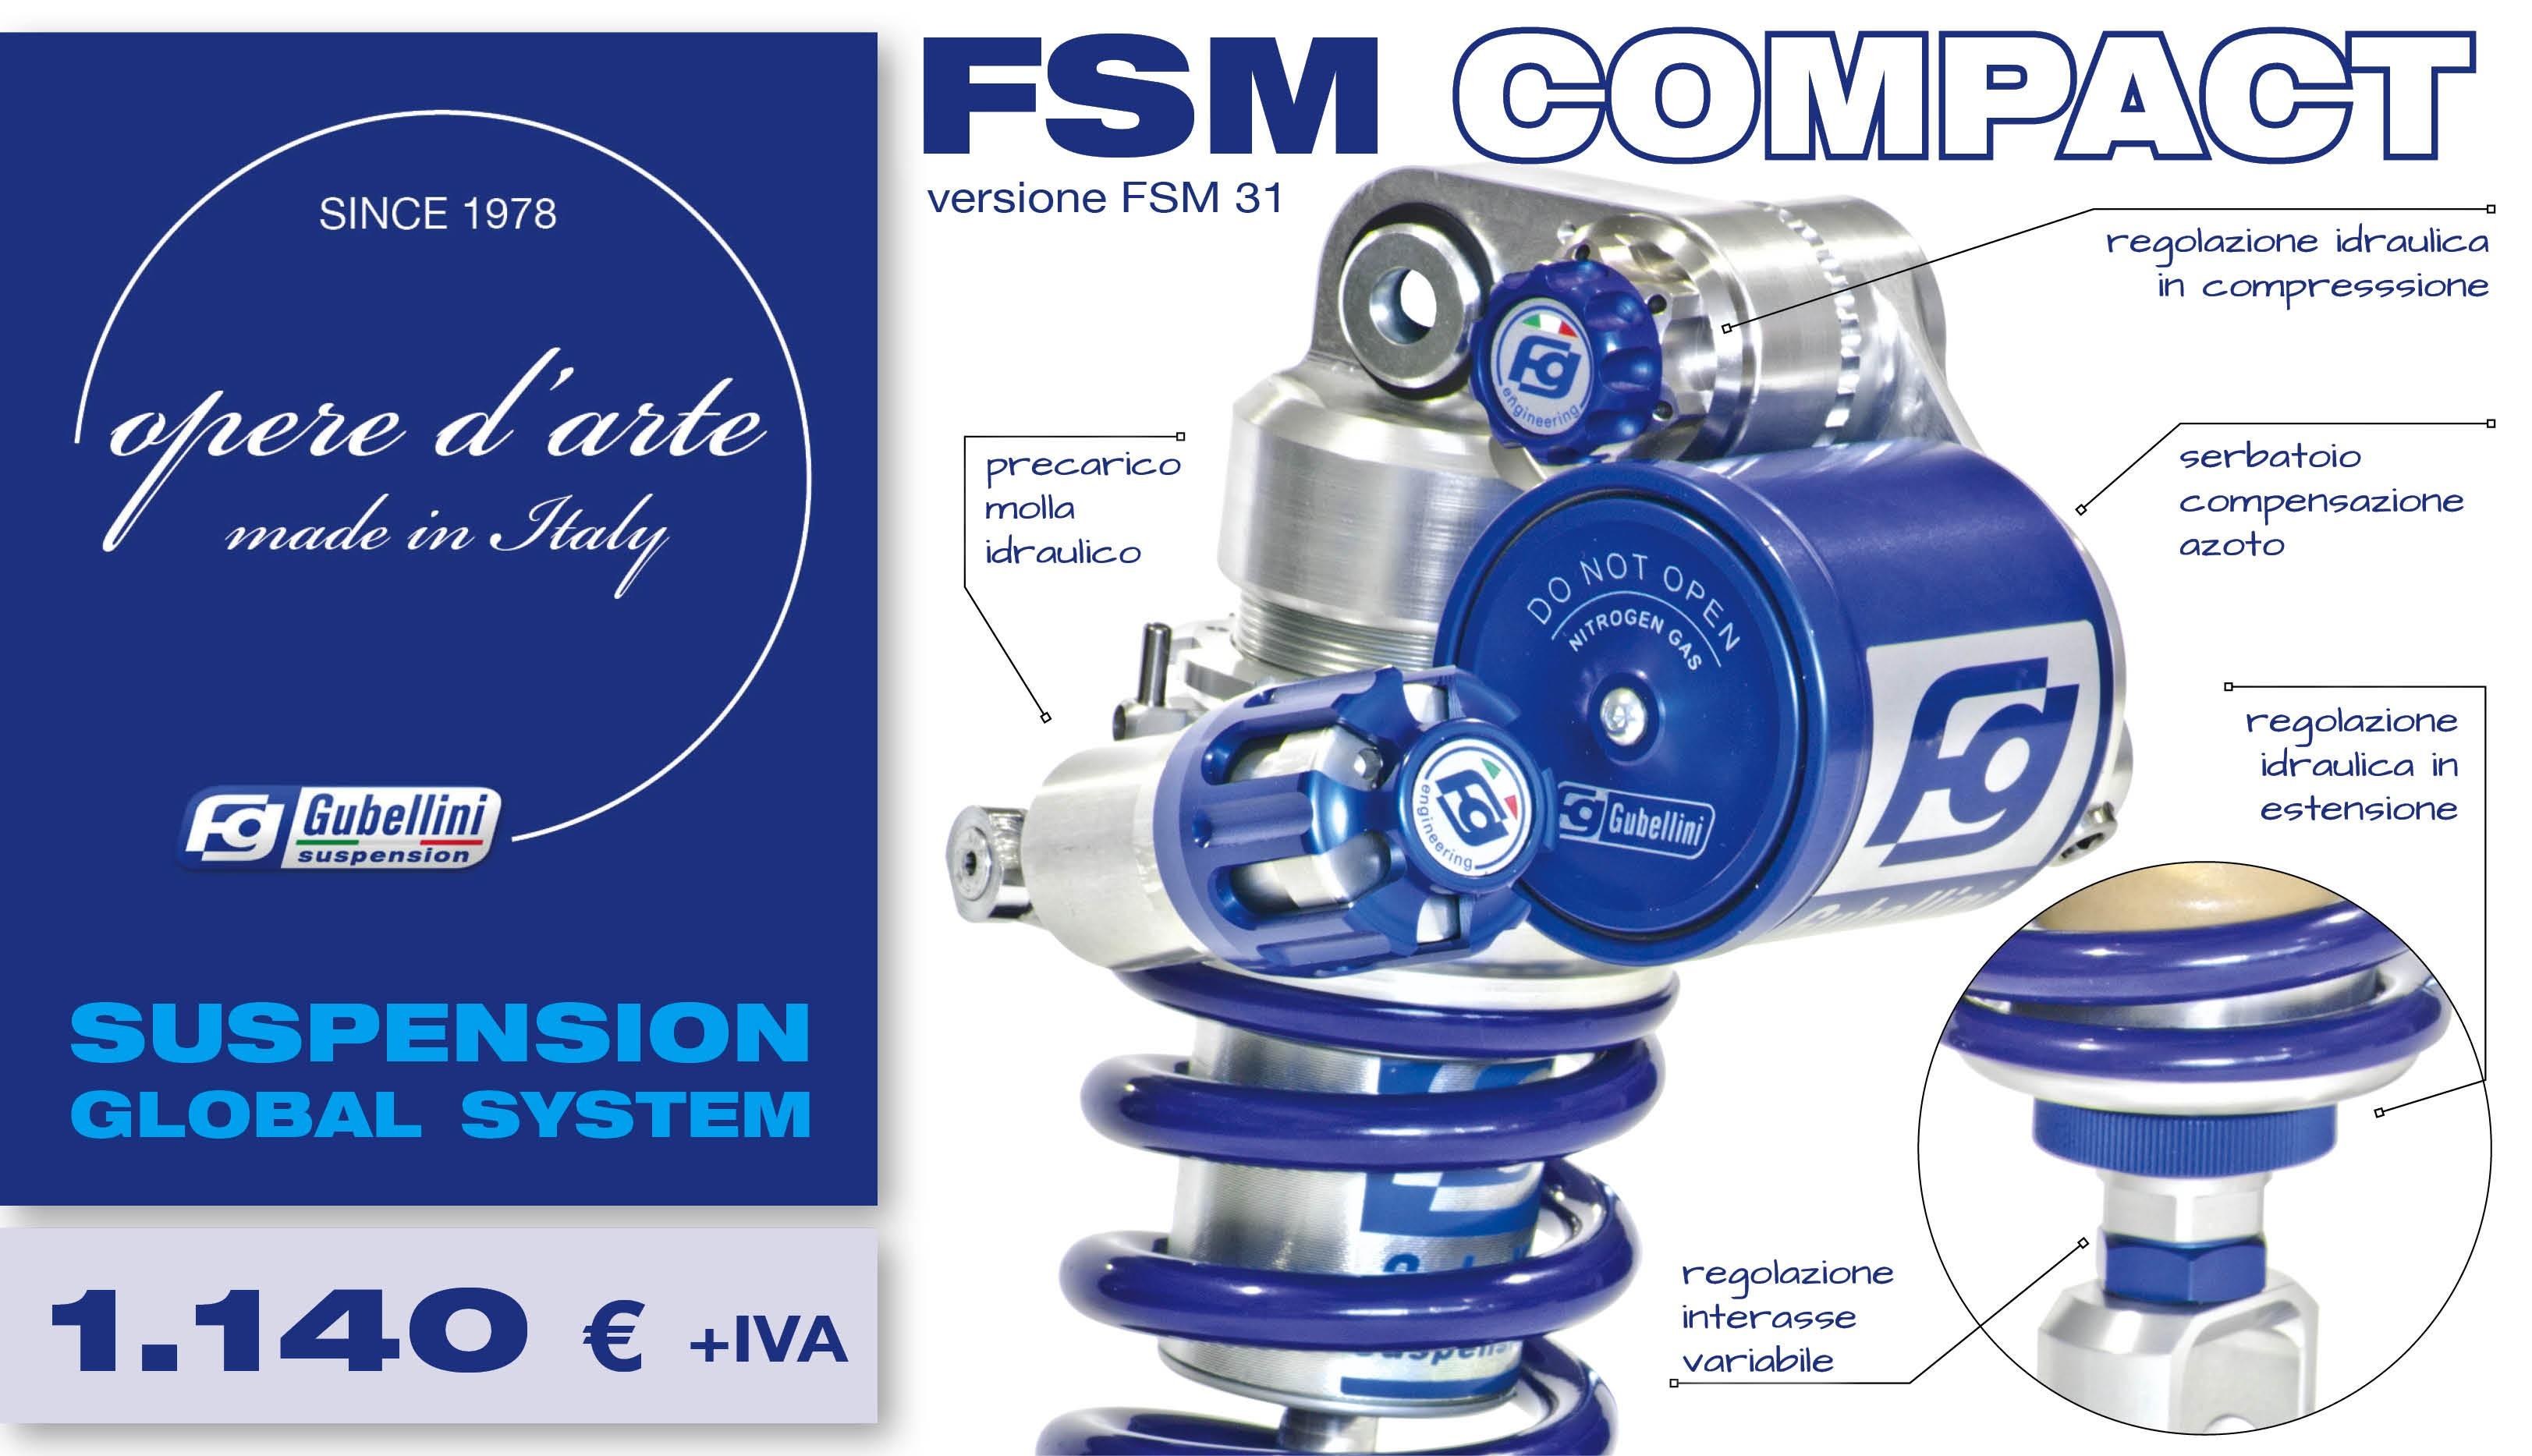 FSM 31 COMPACT